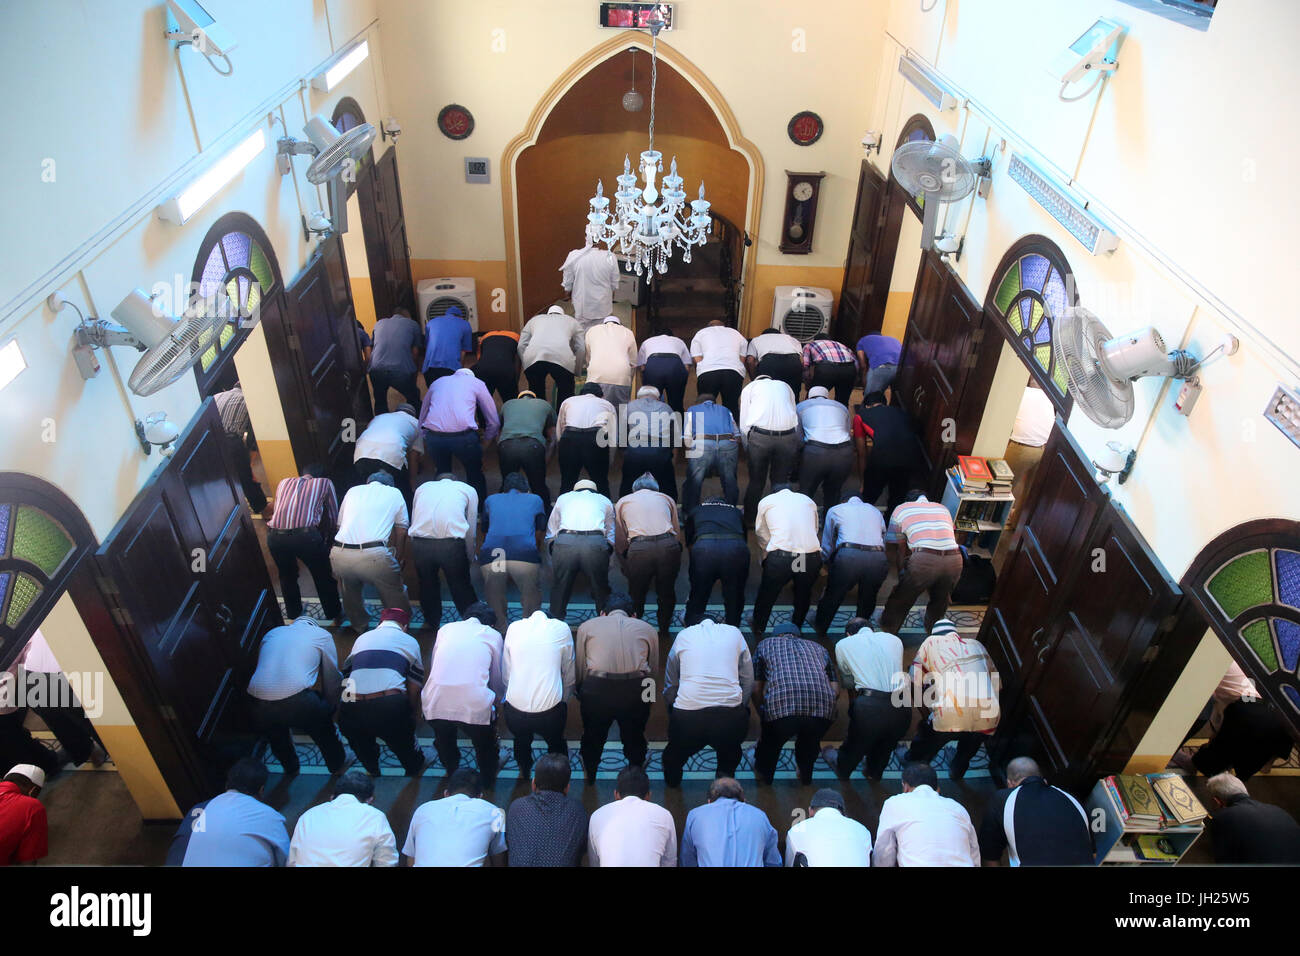 Masjid Al-Abrar Moschee.  Muslime beten. Salat.  Singapur. Stockbild